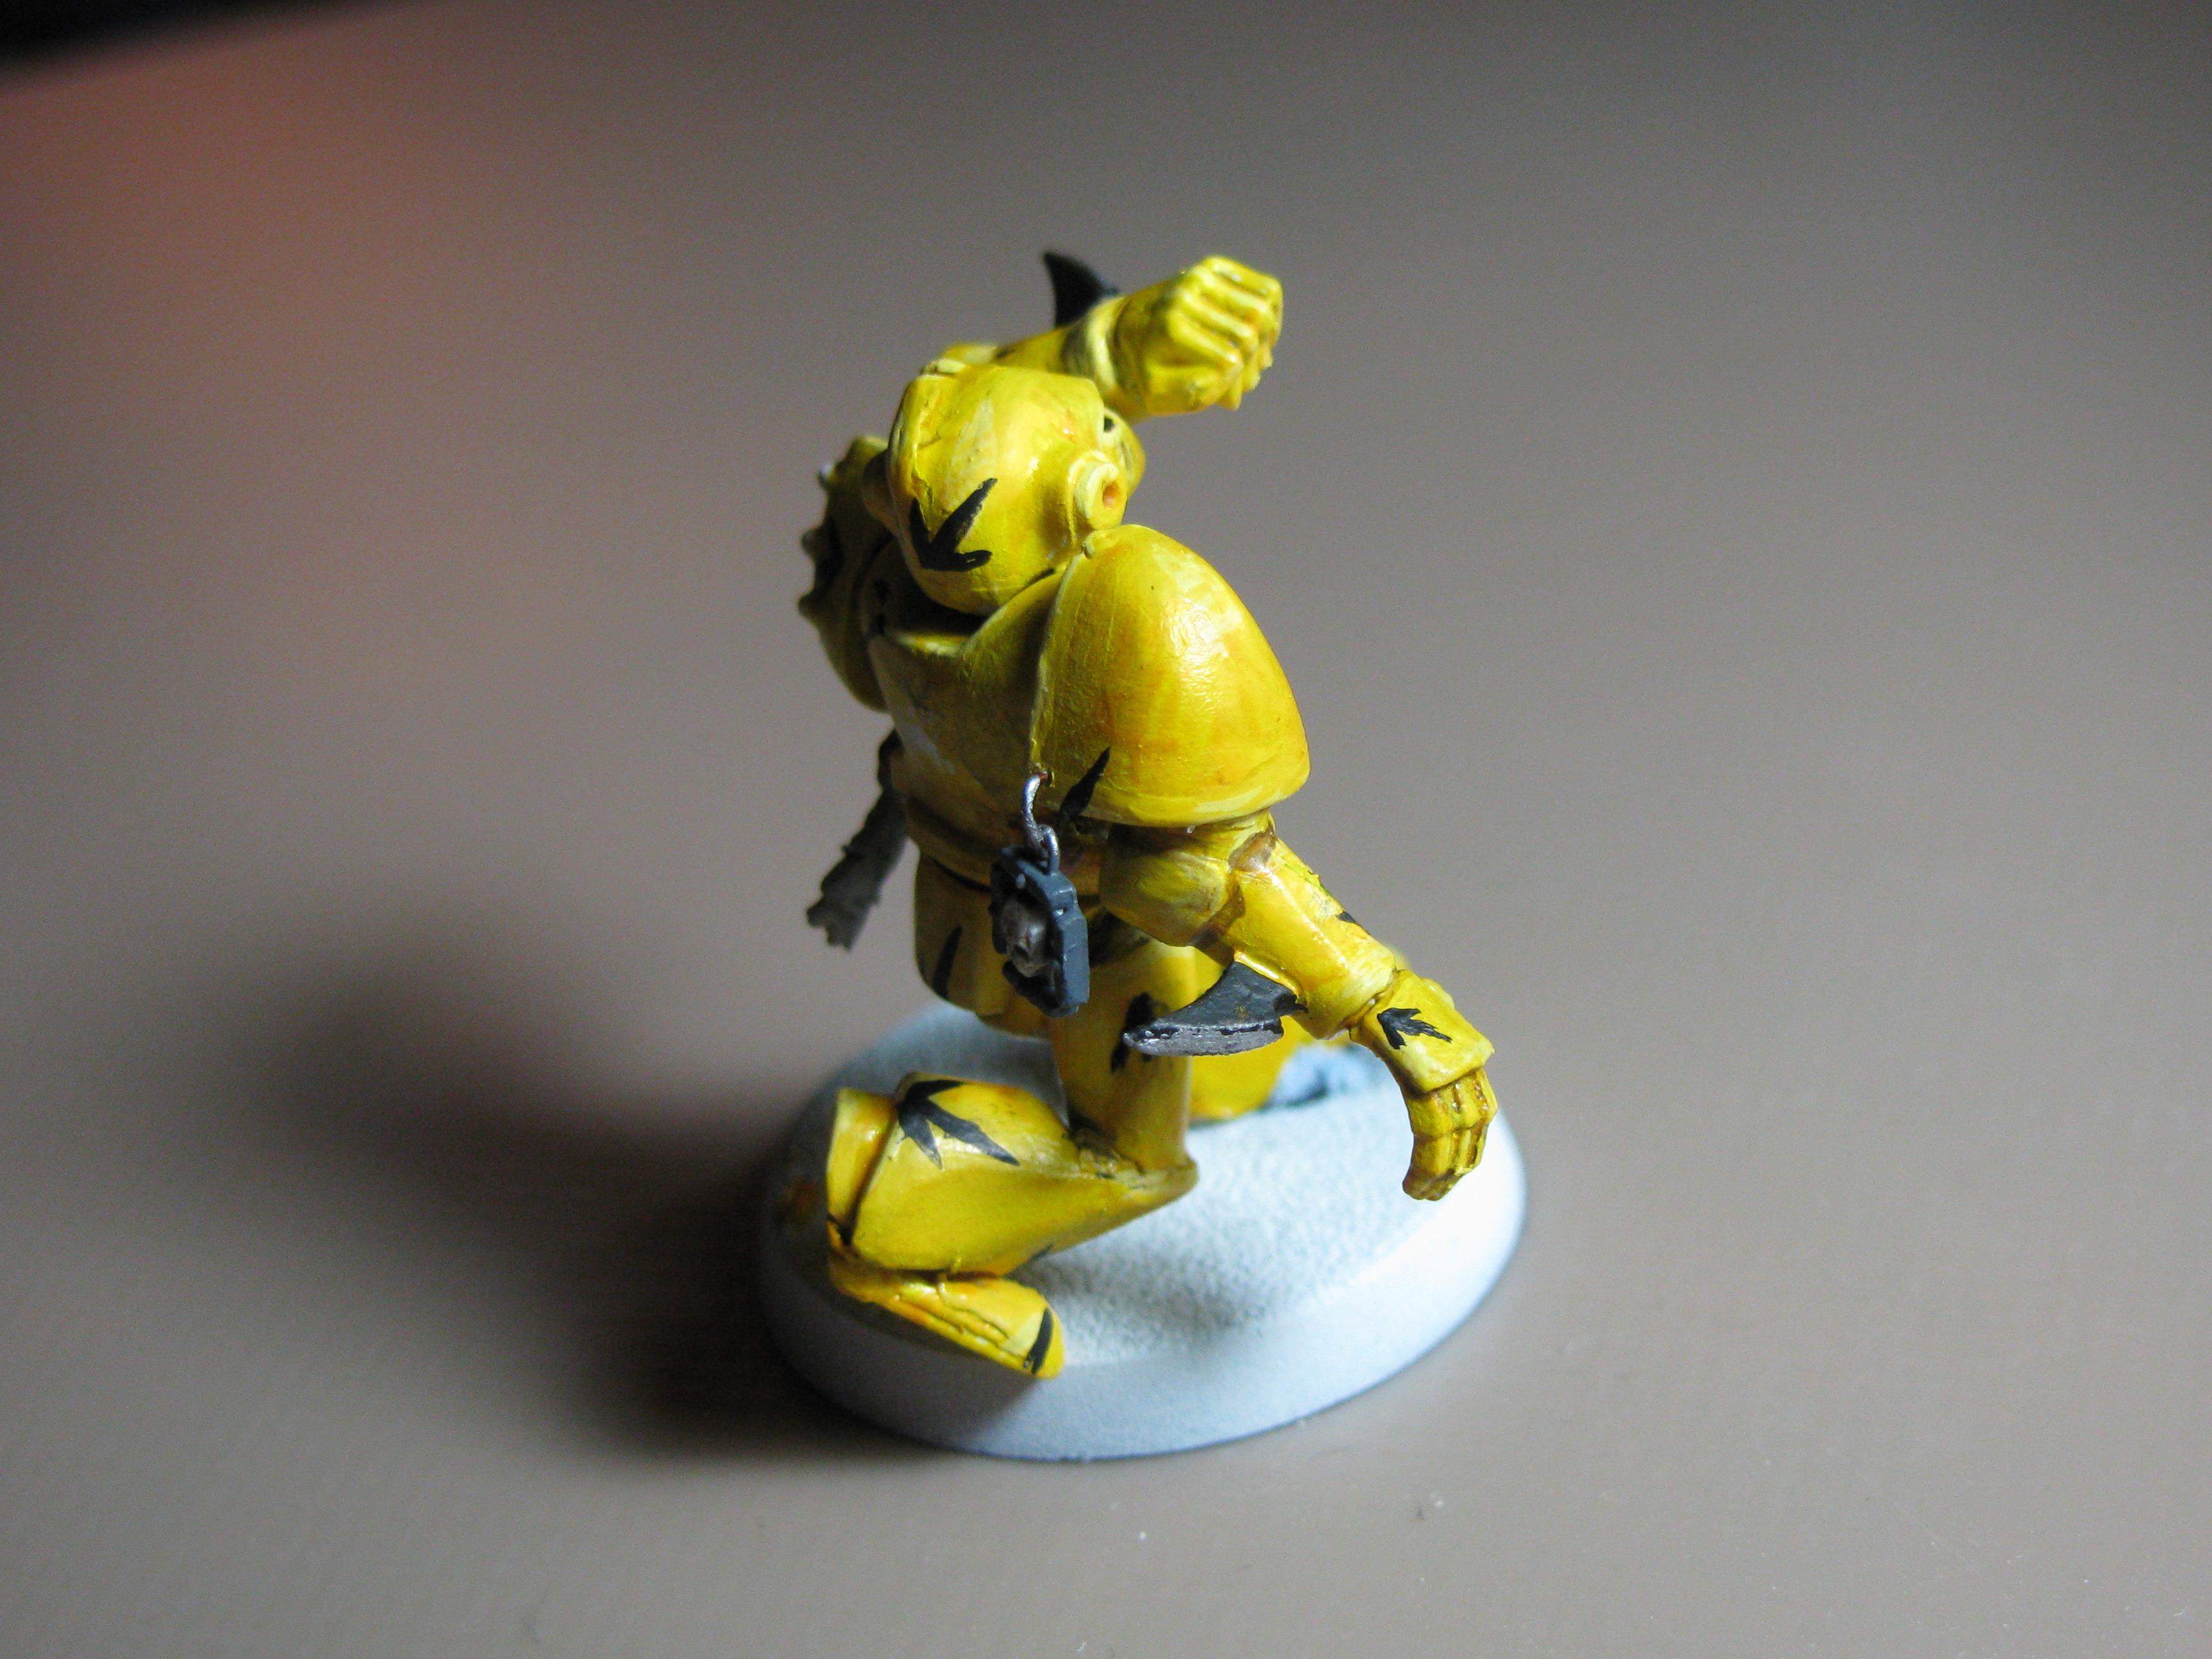 Mantis Warrior, Space Marines, Trade, Tranquility Vet, Work In Progress